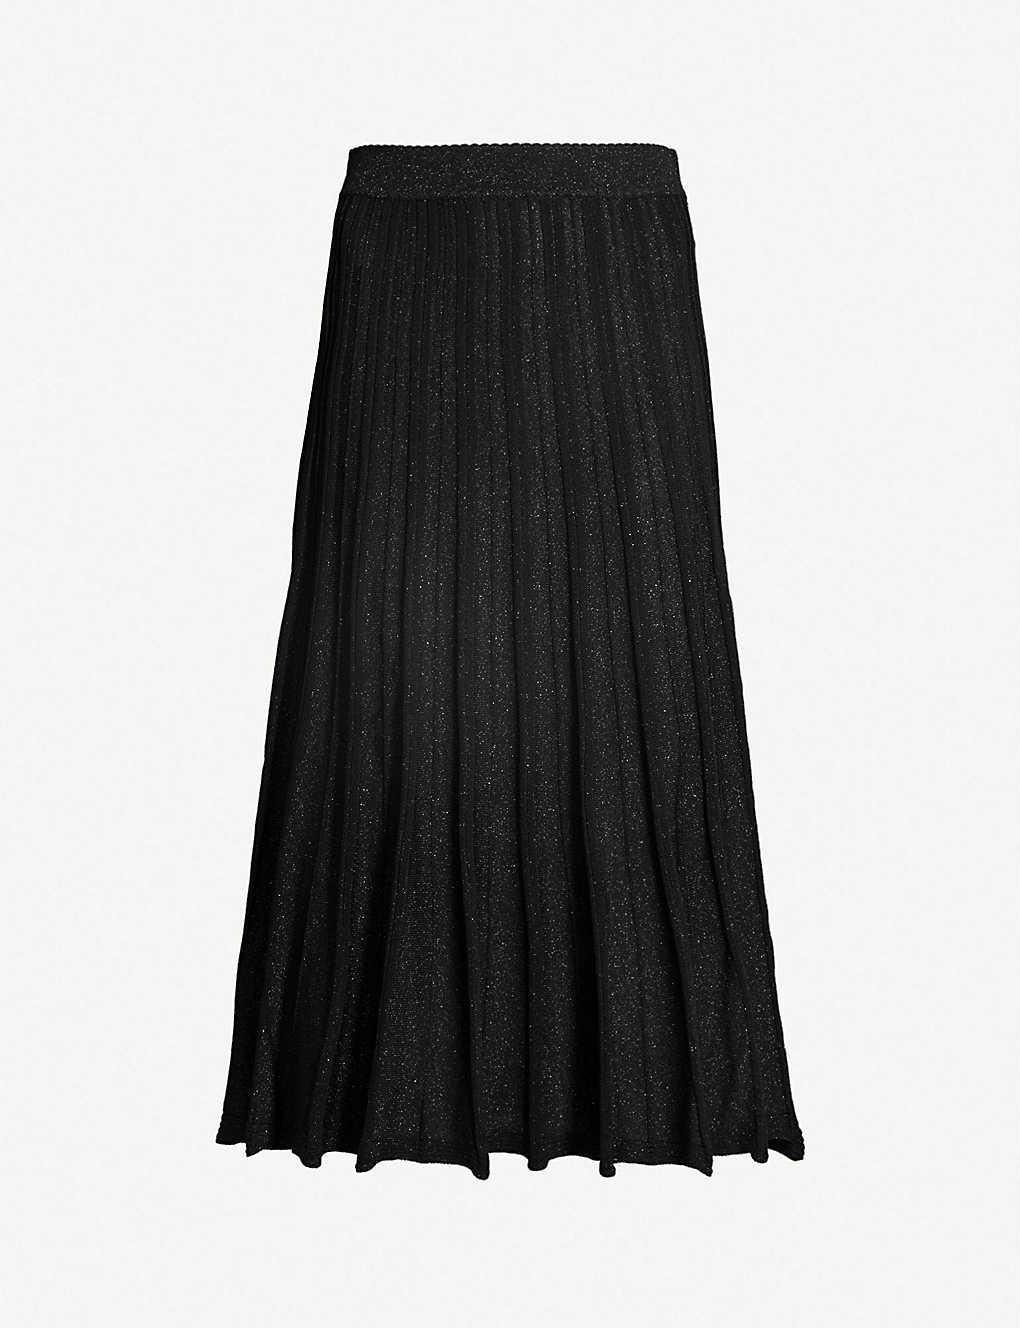 c062b63c59a PINKO - Beagle ribbed metallic stretch-knit midi skirt | Selfridges.com